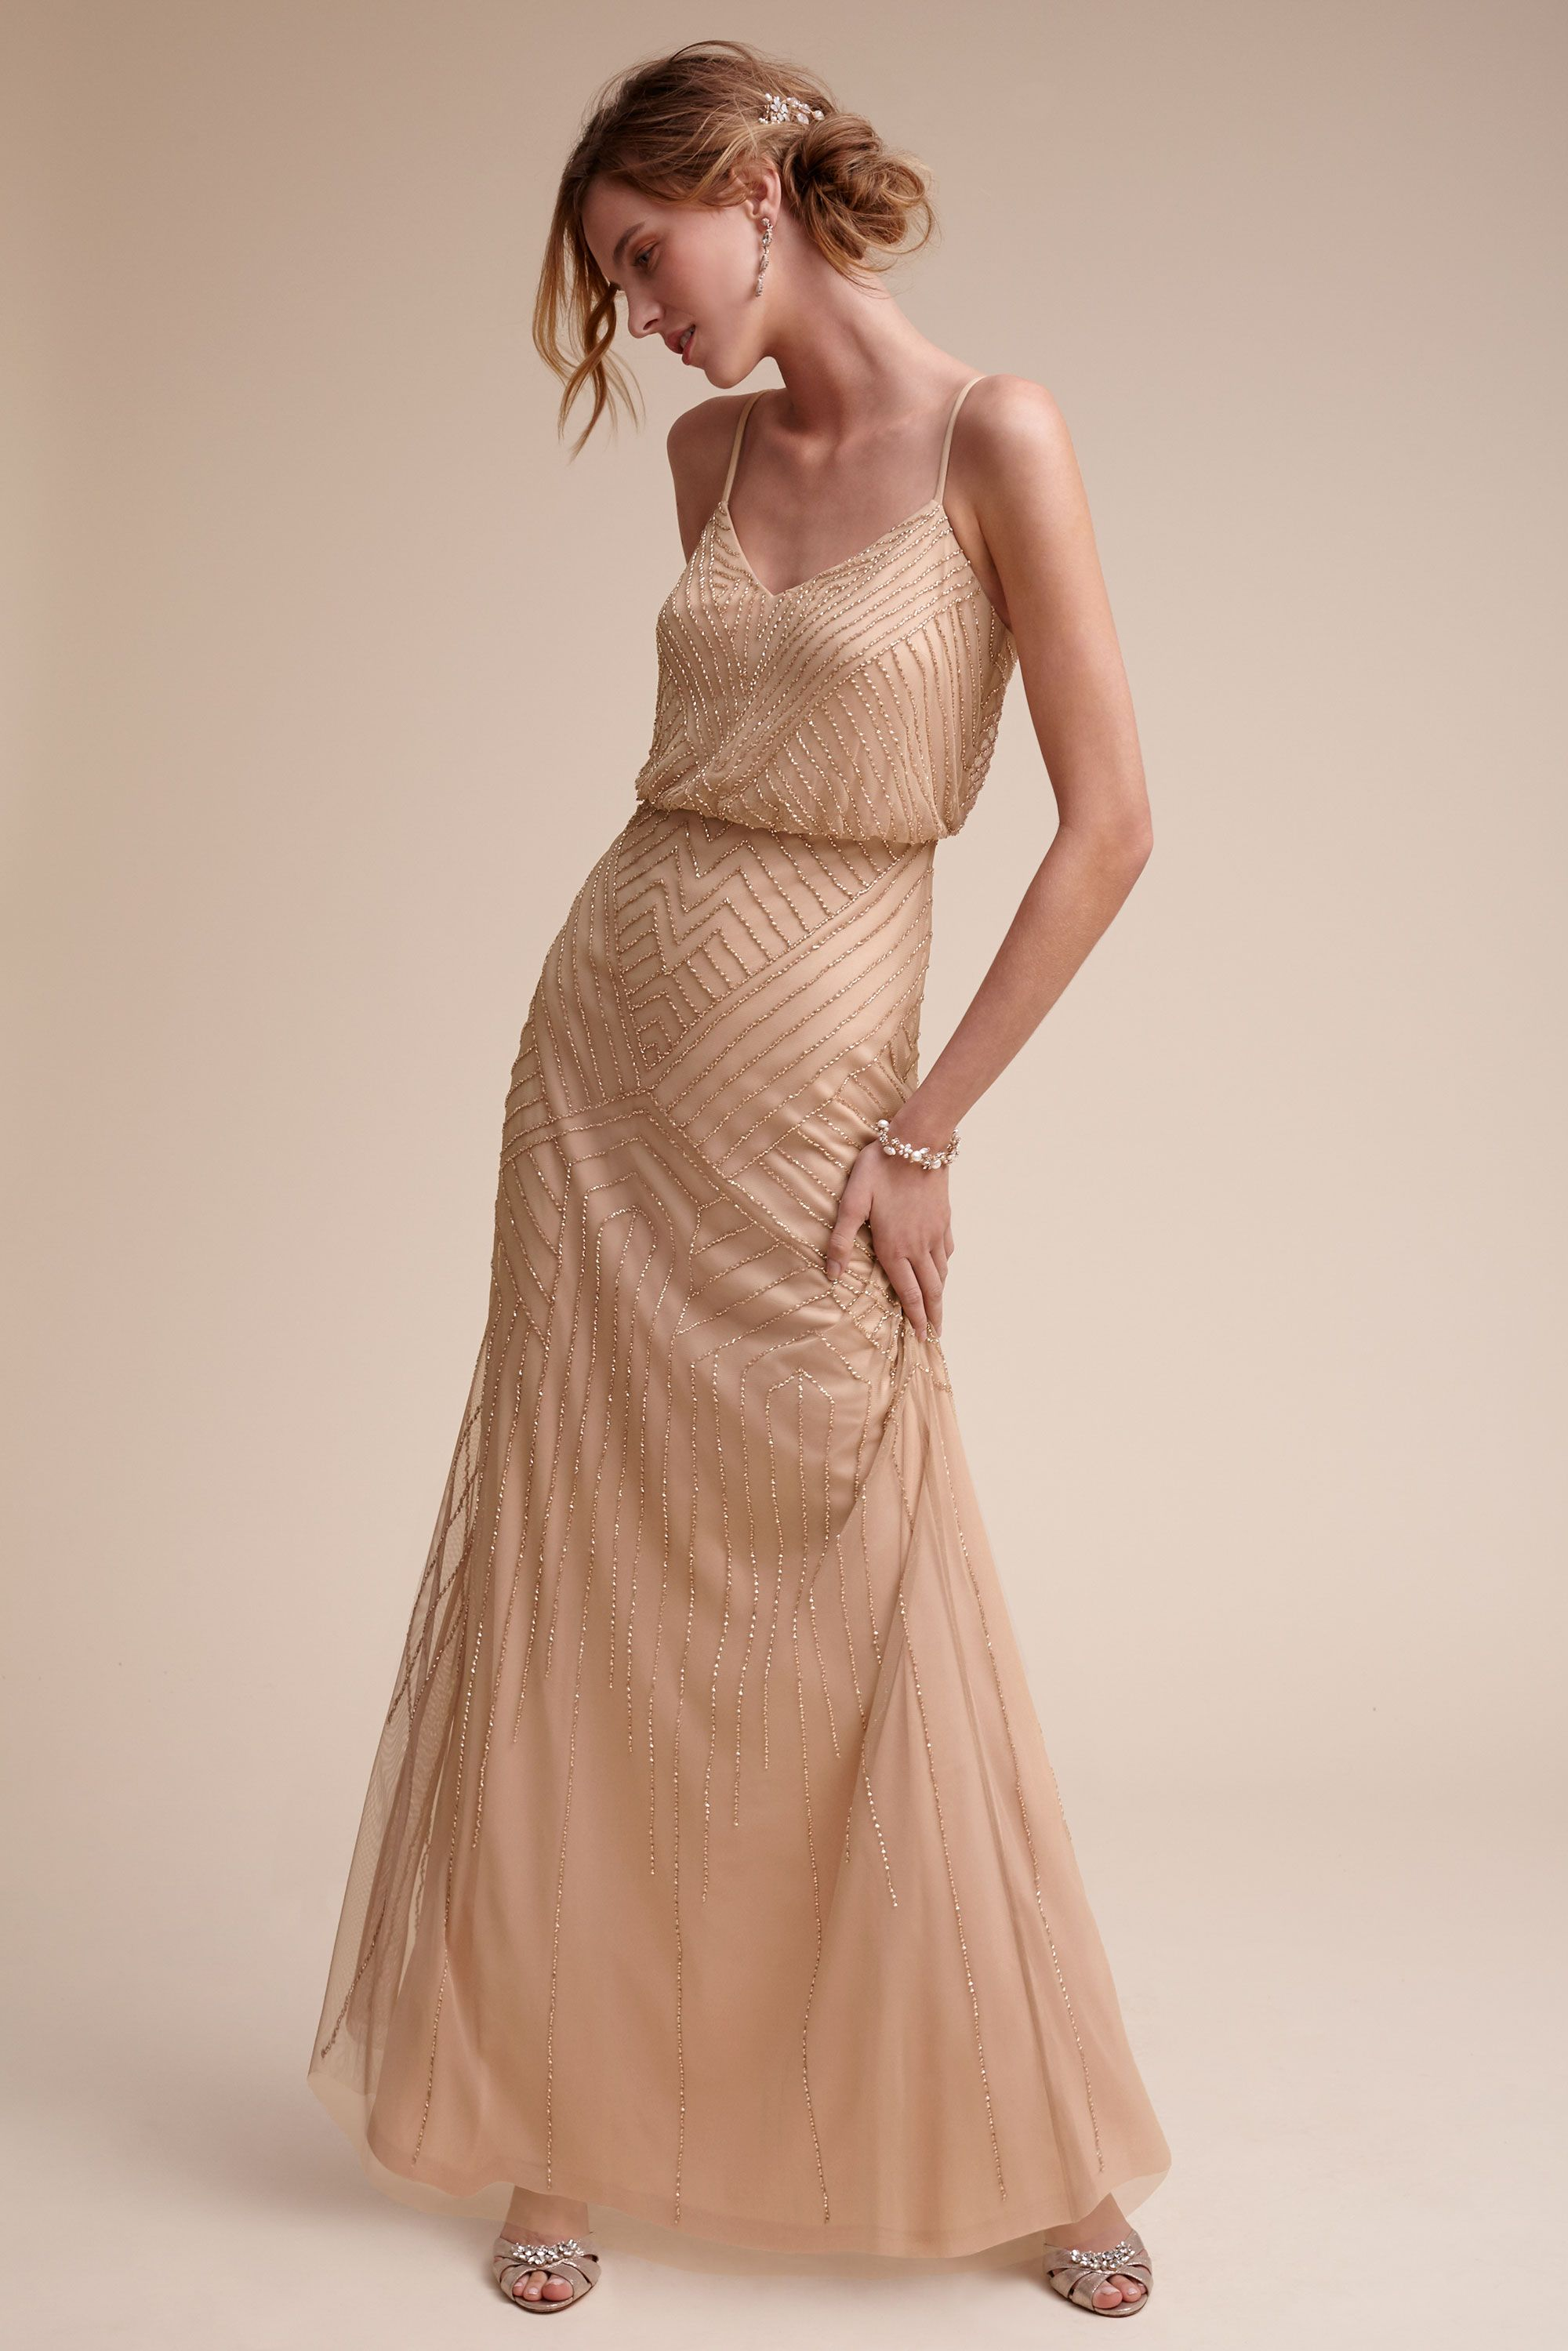 5a6a42a1053 Vintage Rose Gold Bridesmaid Dresses